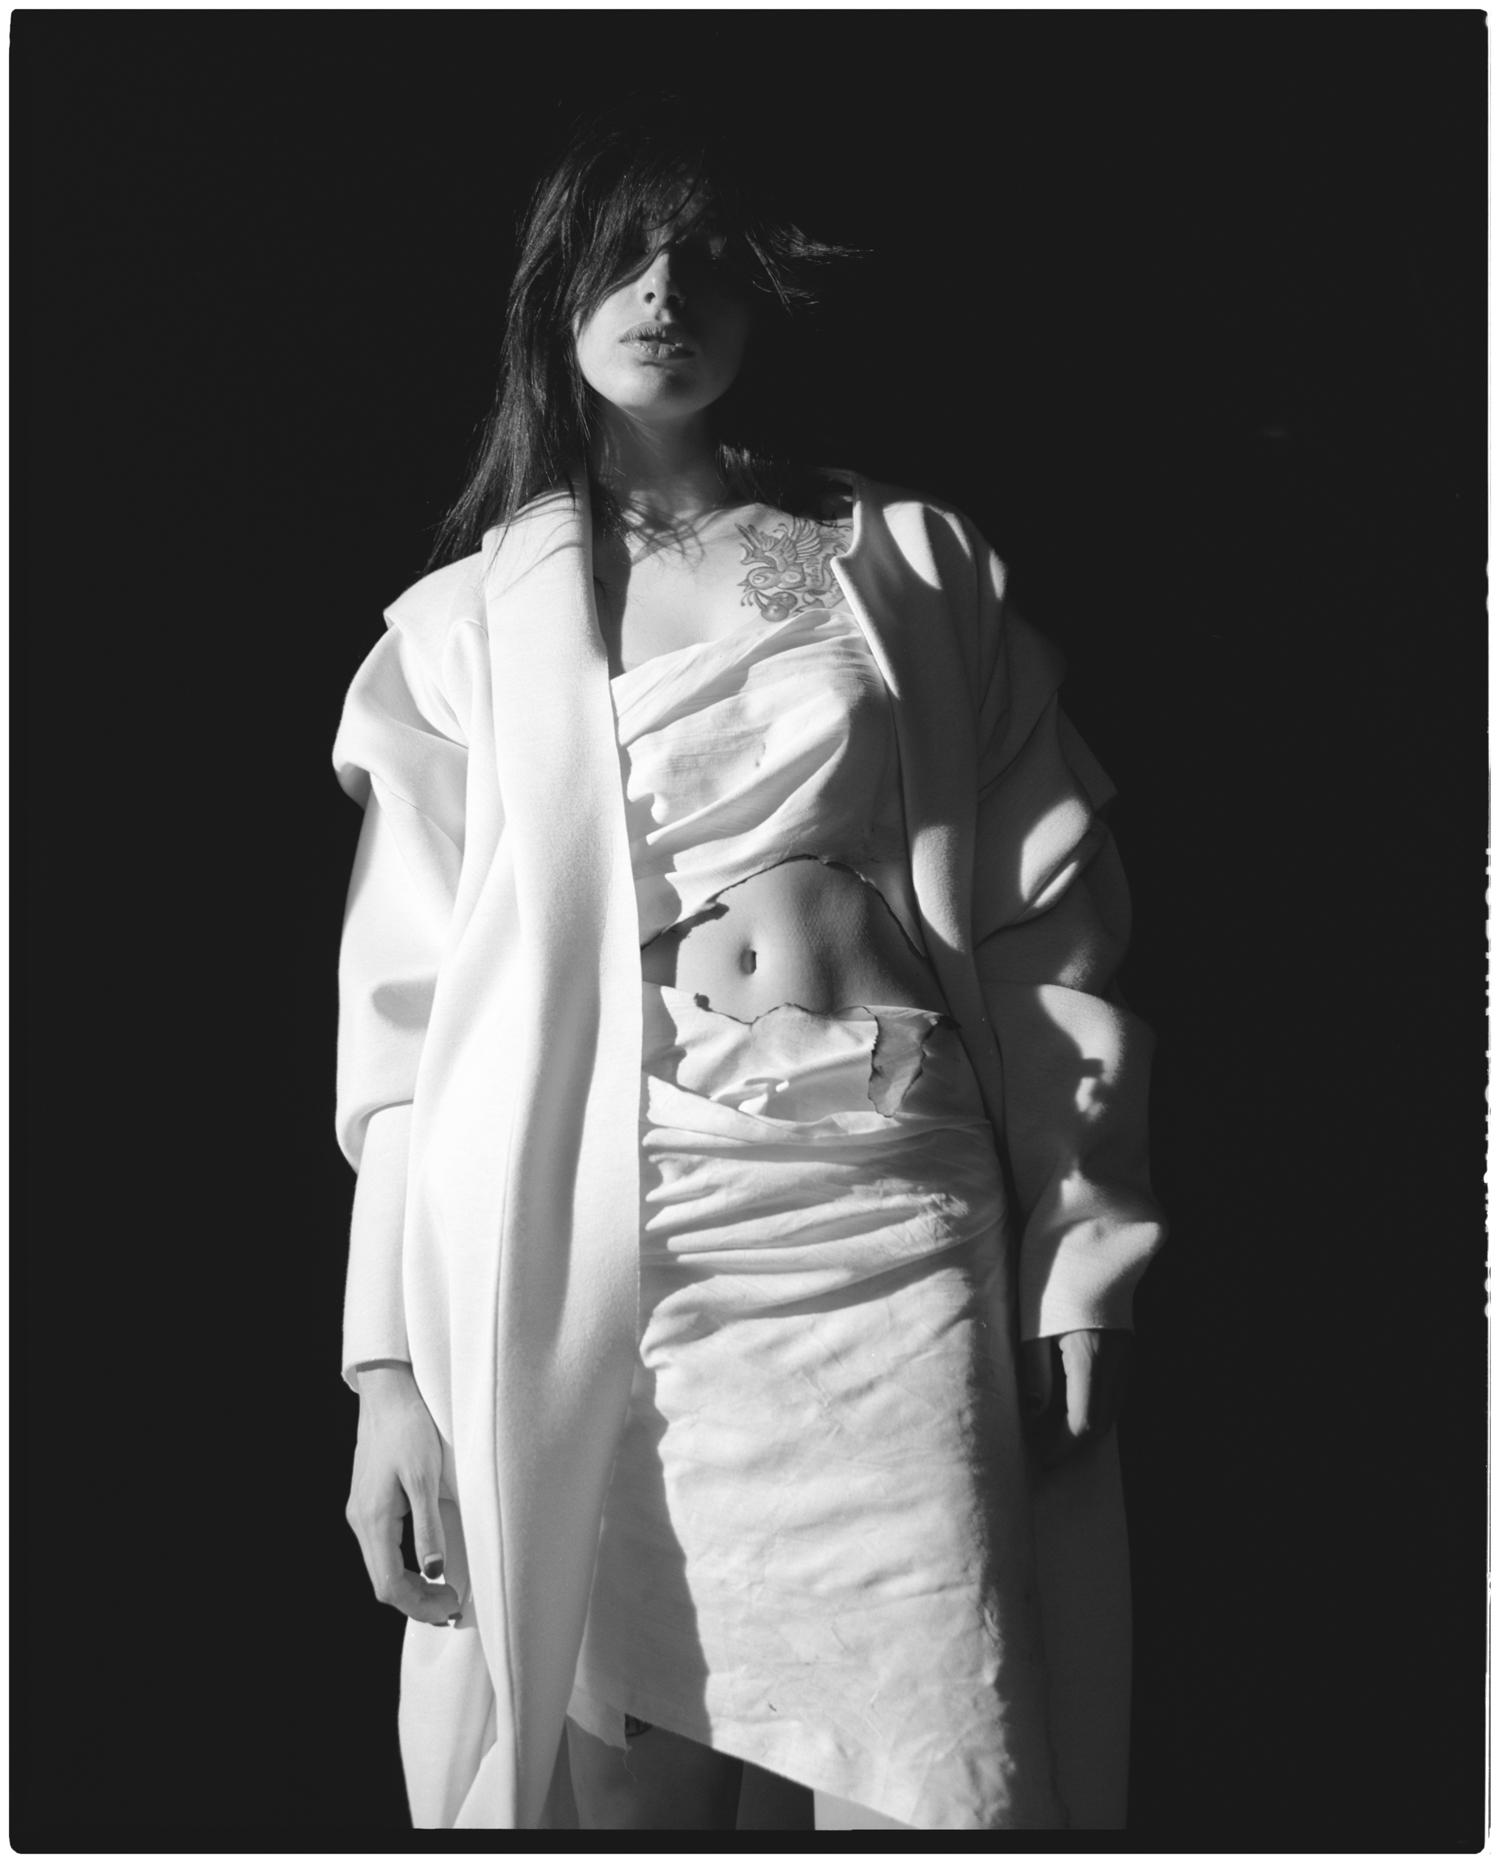 Coat Katerina Soloviova, dress made by stylist